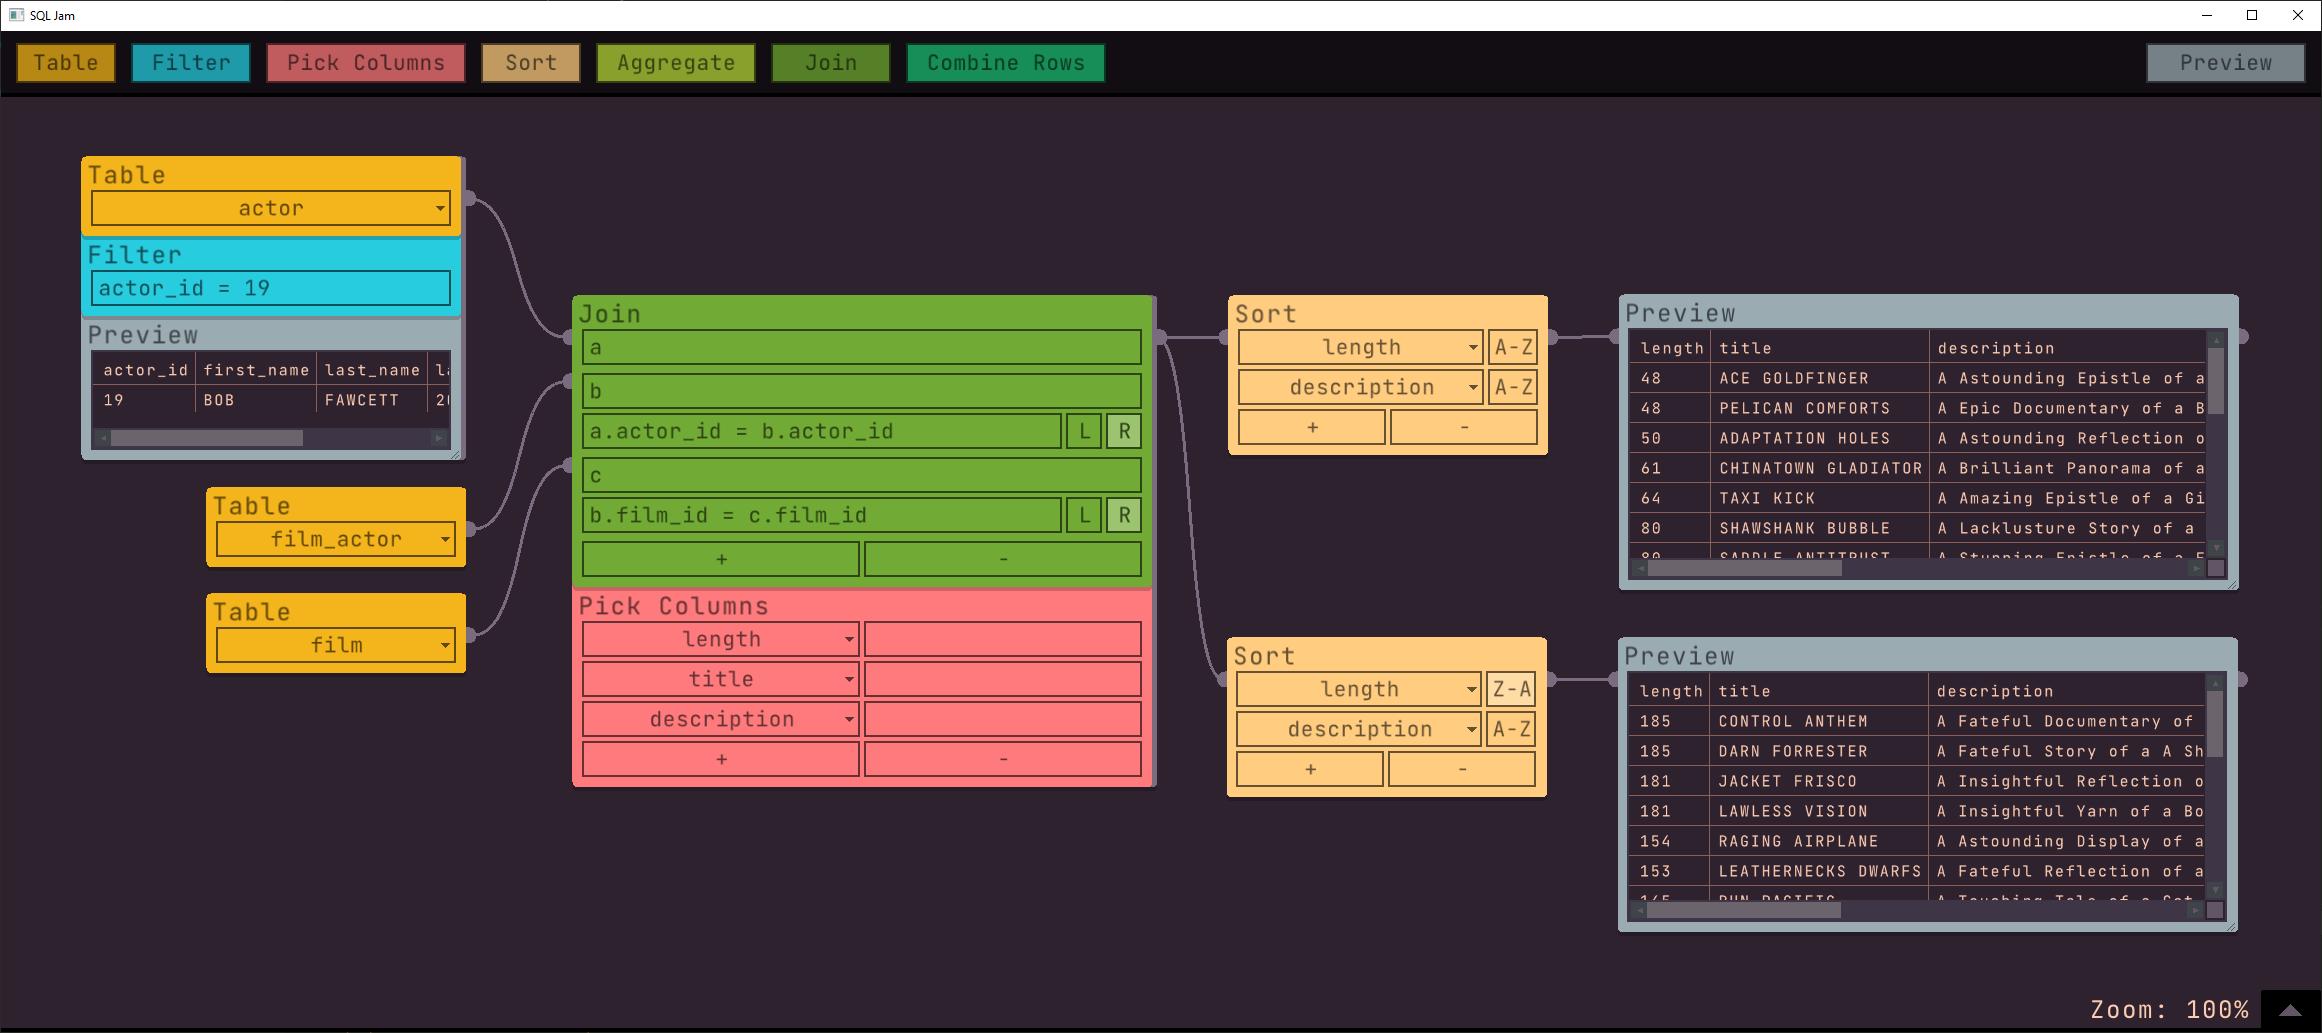 Screenshot 2021-10-03 212448.png